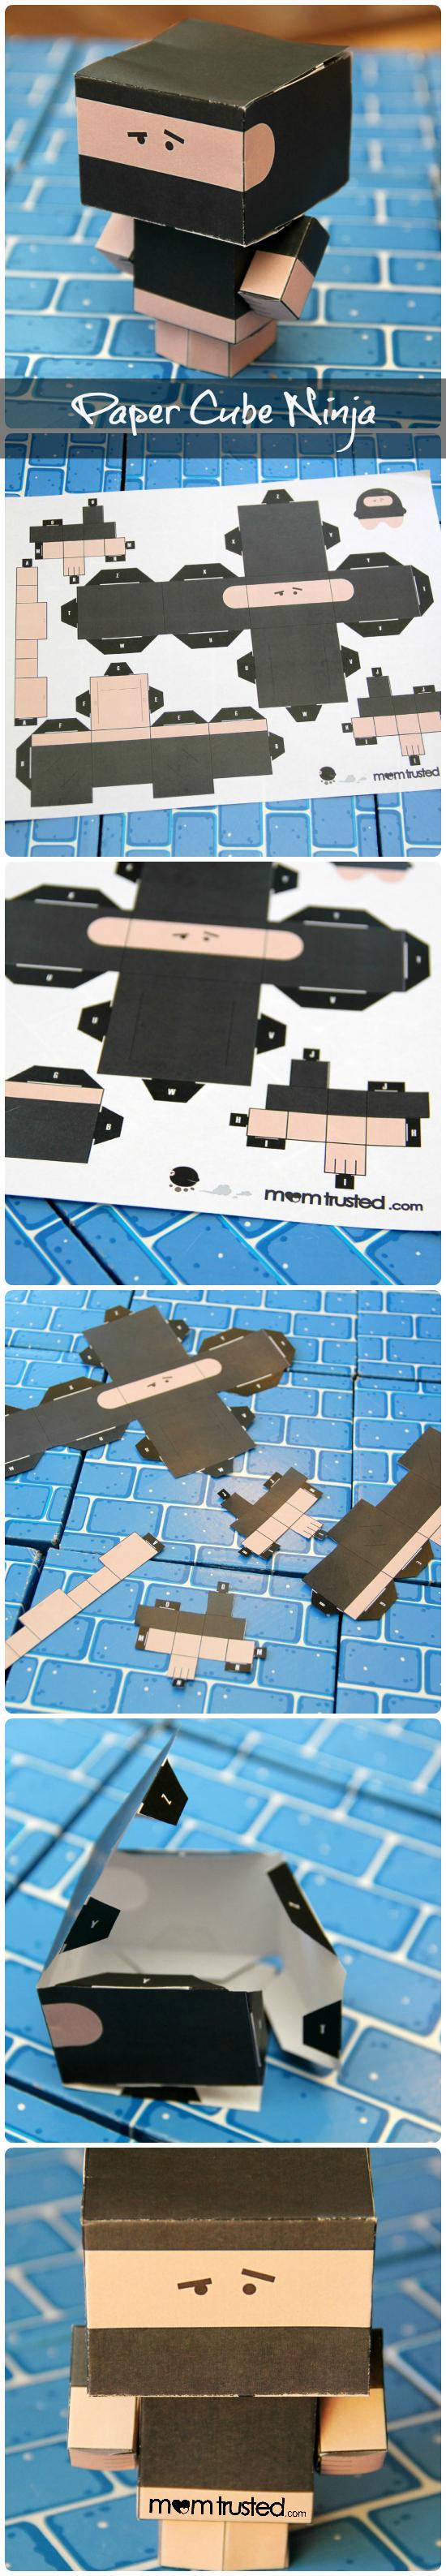 paper cube ninja collage txt